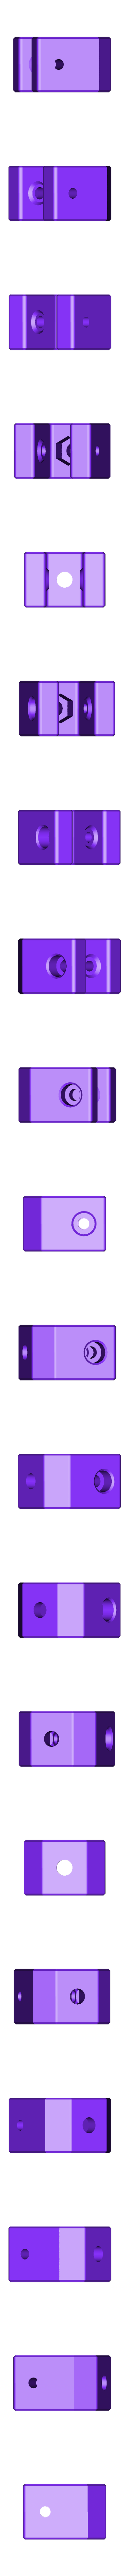 AnetE10_Xtensioner_Slider.STL Download free STL file Anet E10: Y belt tensioner • Object to 3D print, MrCrankyface